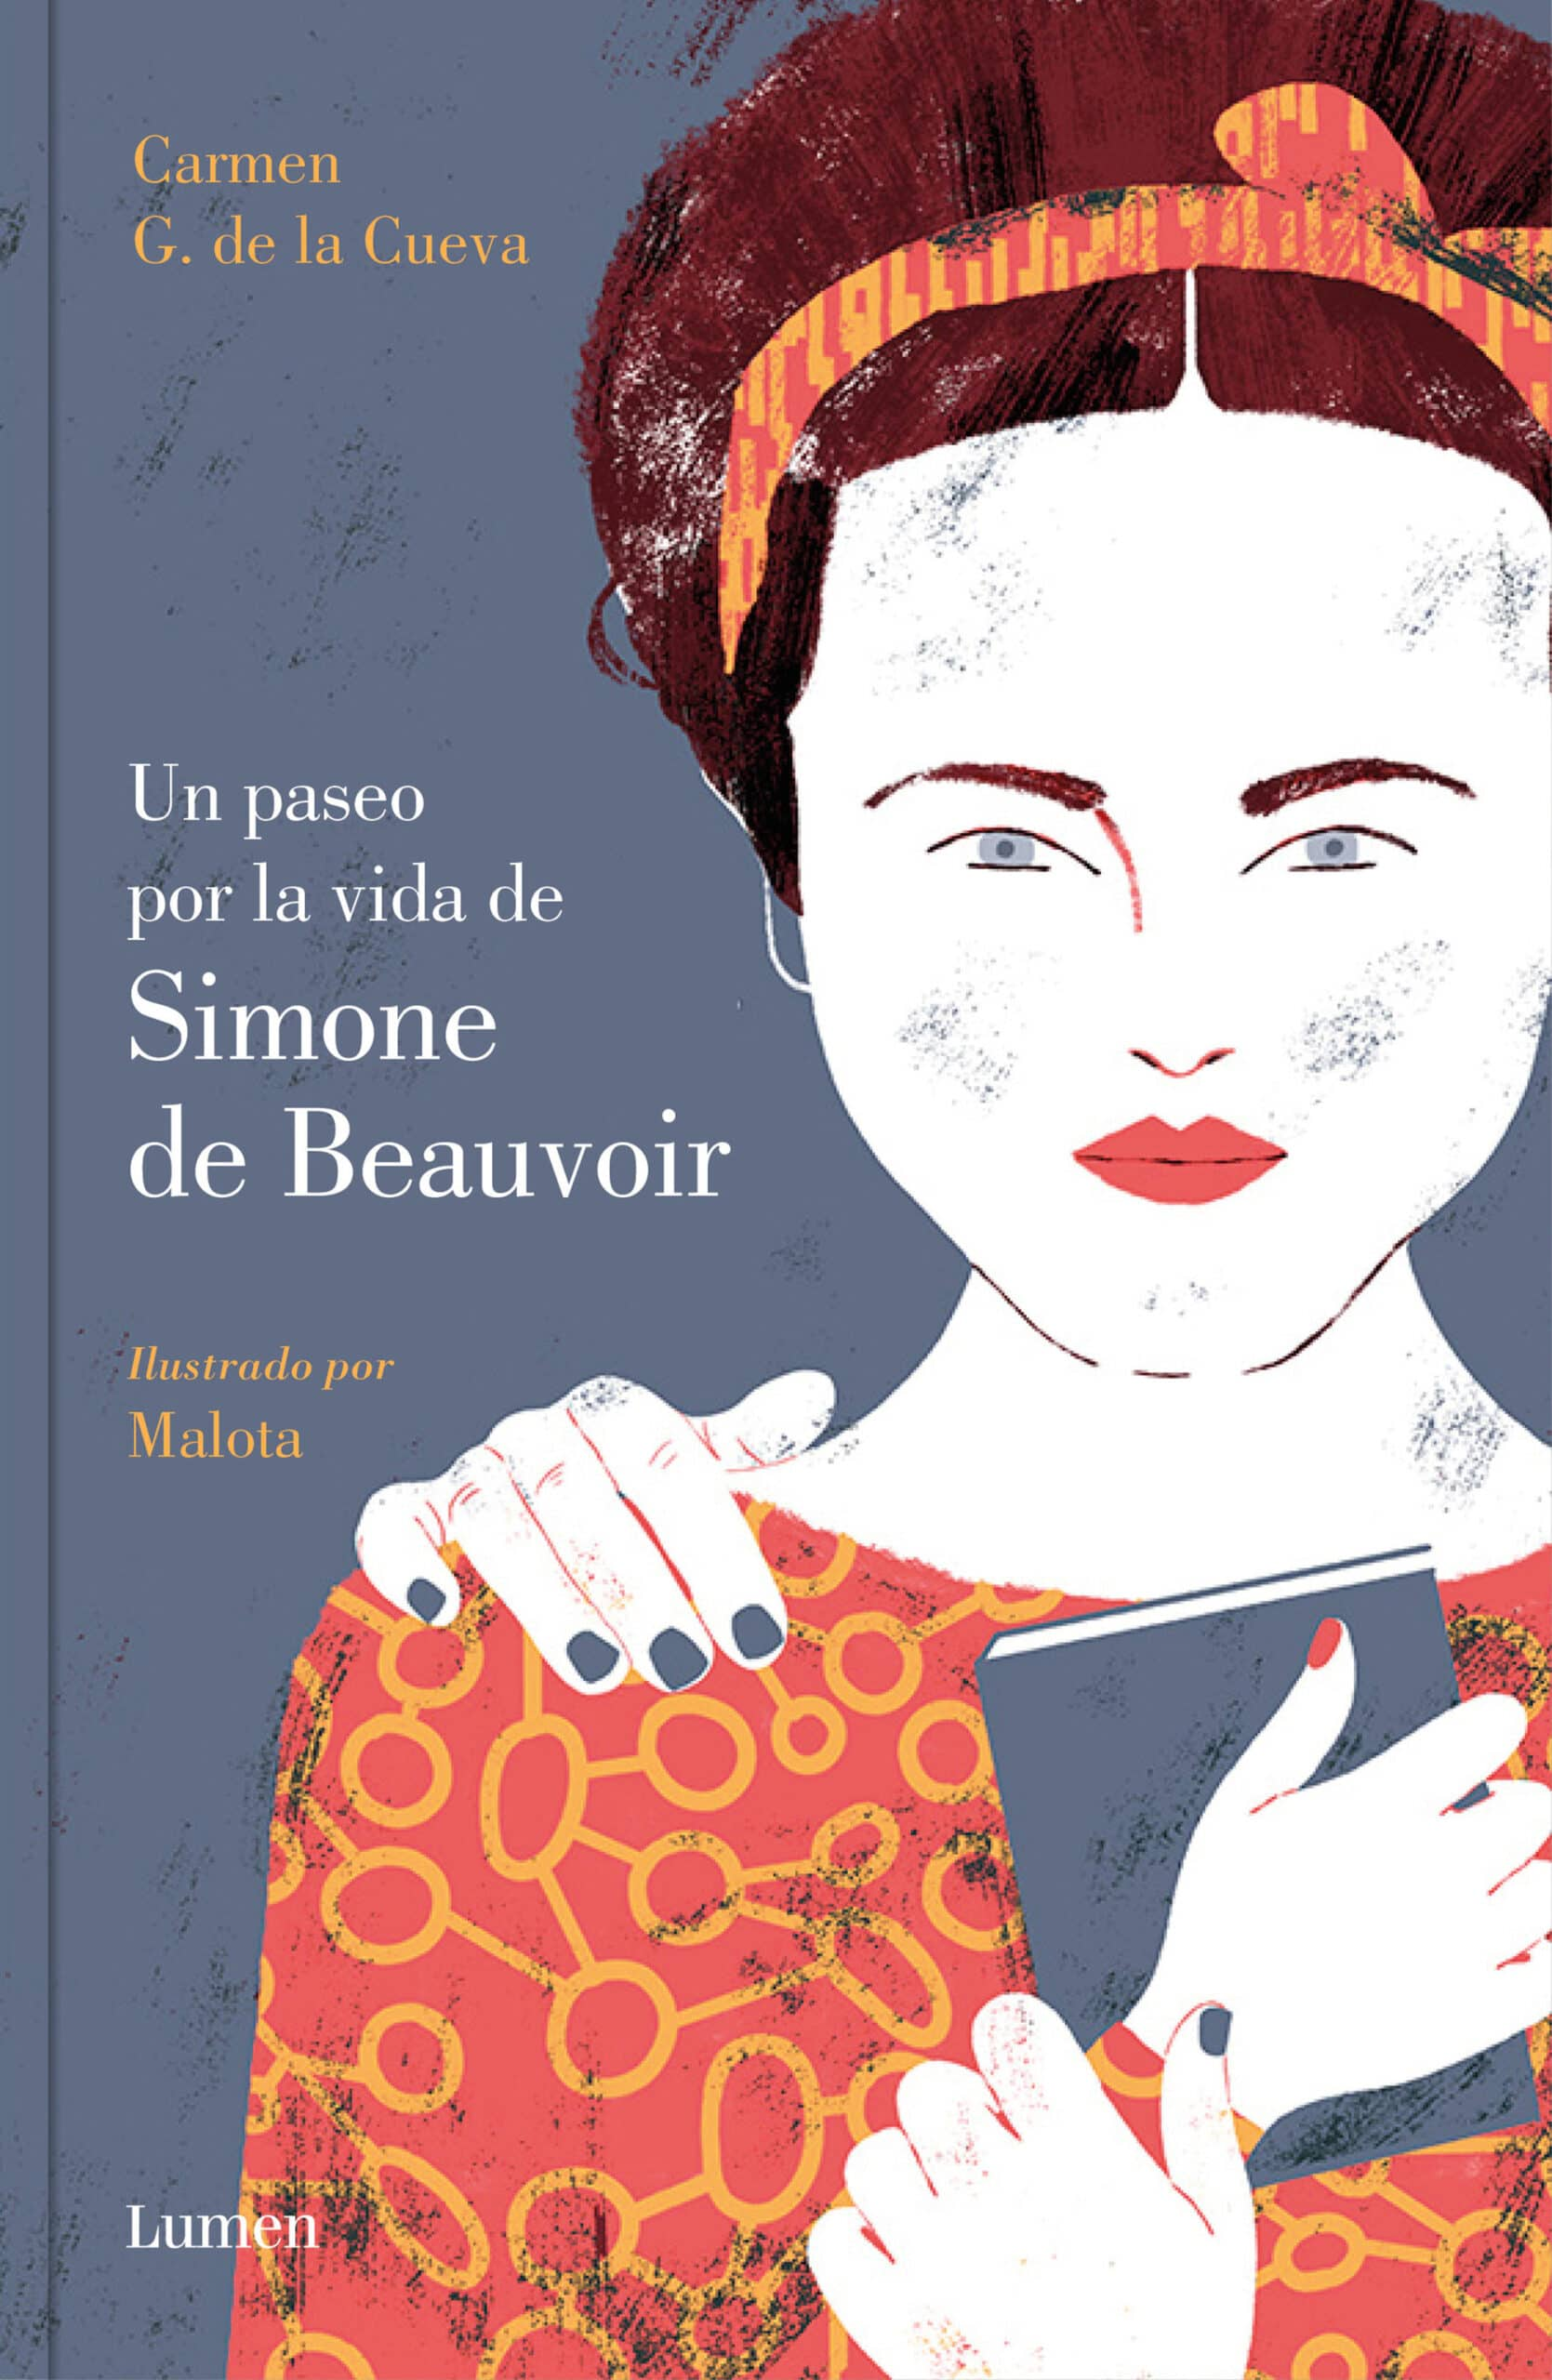 Una paseo por la vida de Simone de Beauvoir